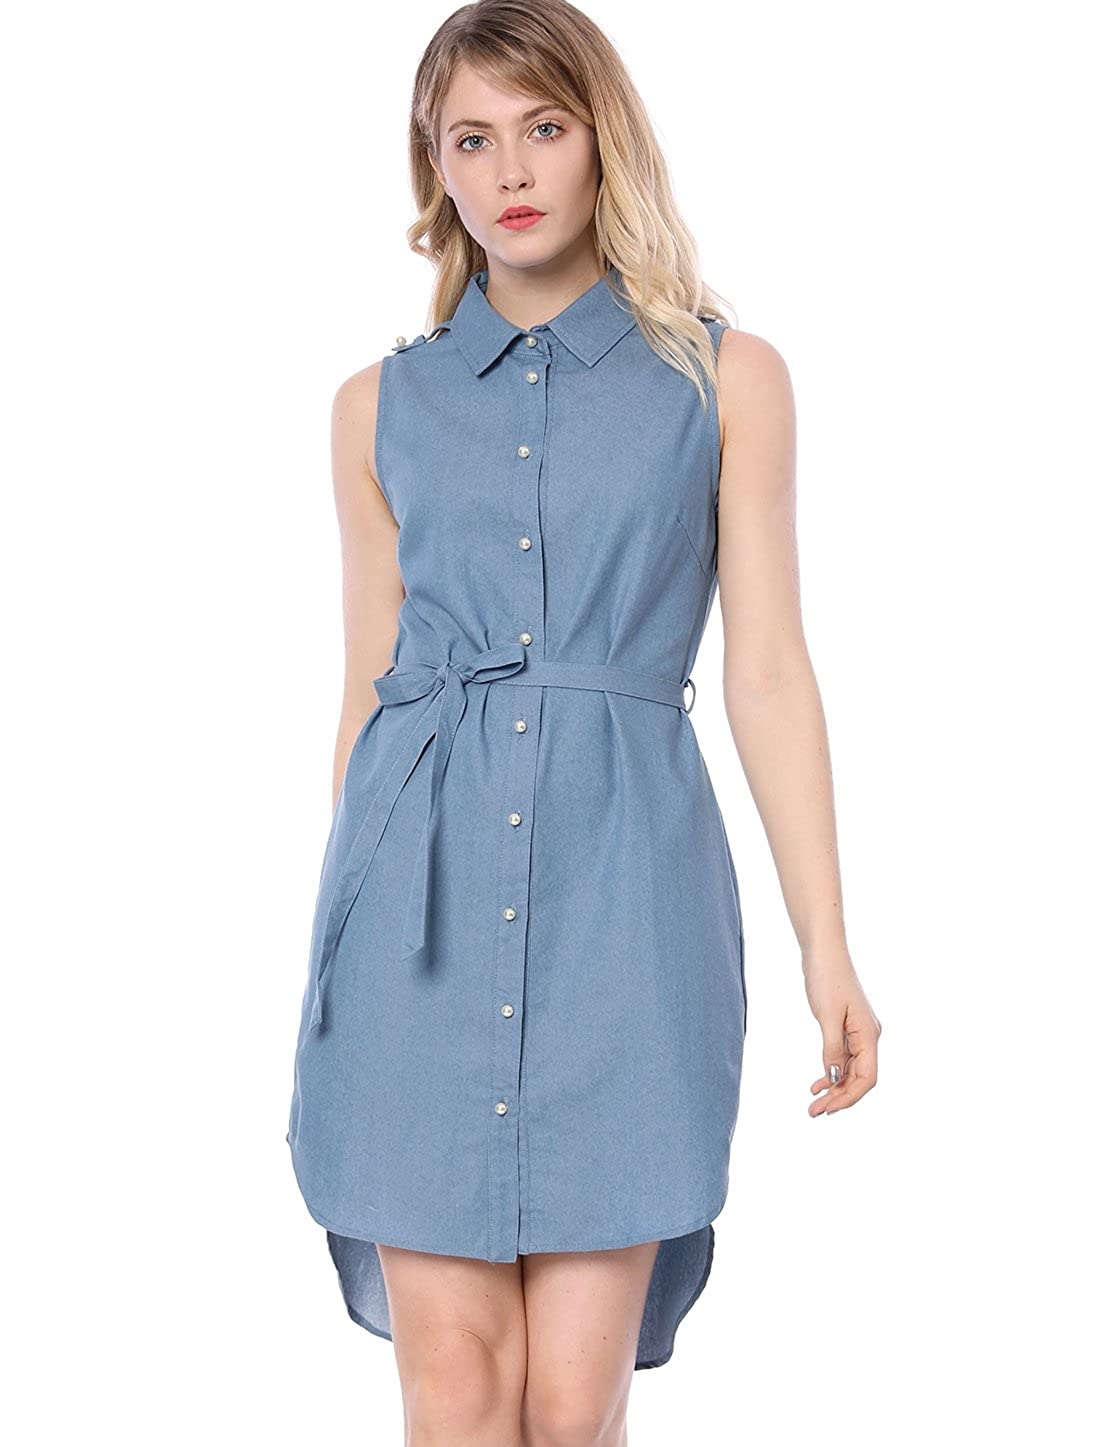 5cf2a898c2 Allegra K Women s Chambray Pearl Button Down Sleeveless Tie Waist Denim  Shirt Dress at Amazon Women s Clothing store